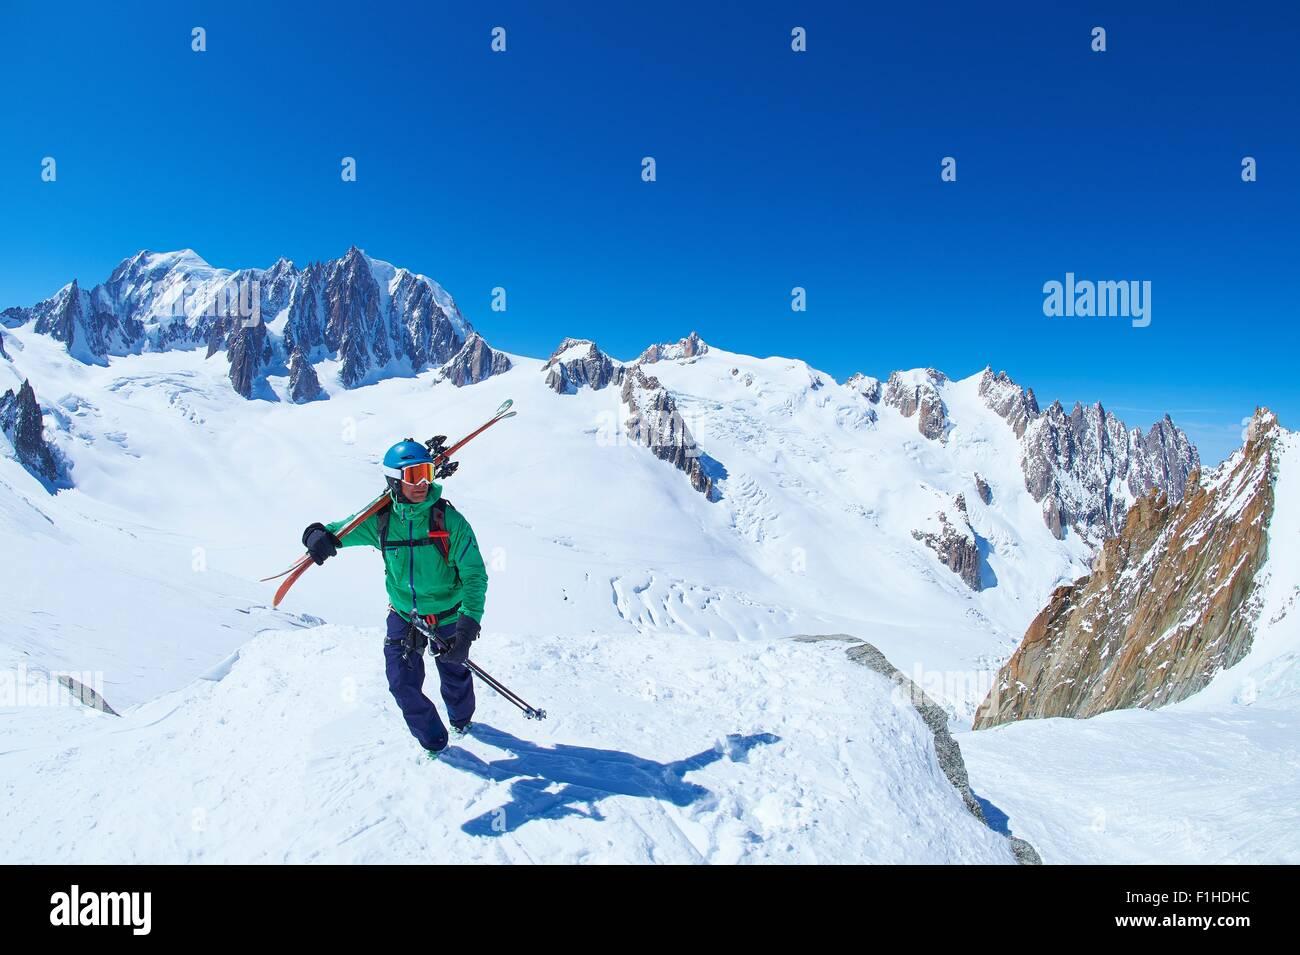 Mature male skier on ridge at Mont Blanc massif, Graian Alps, France - Stock Image